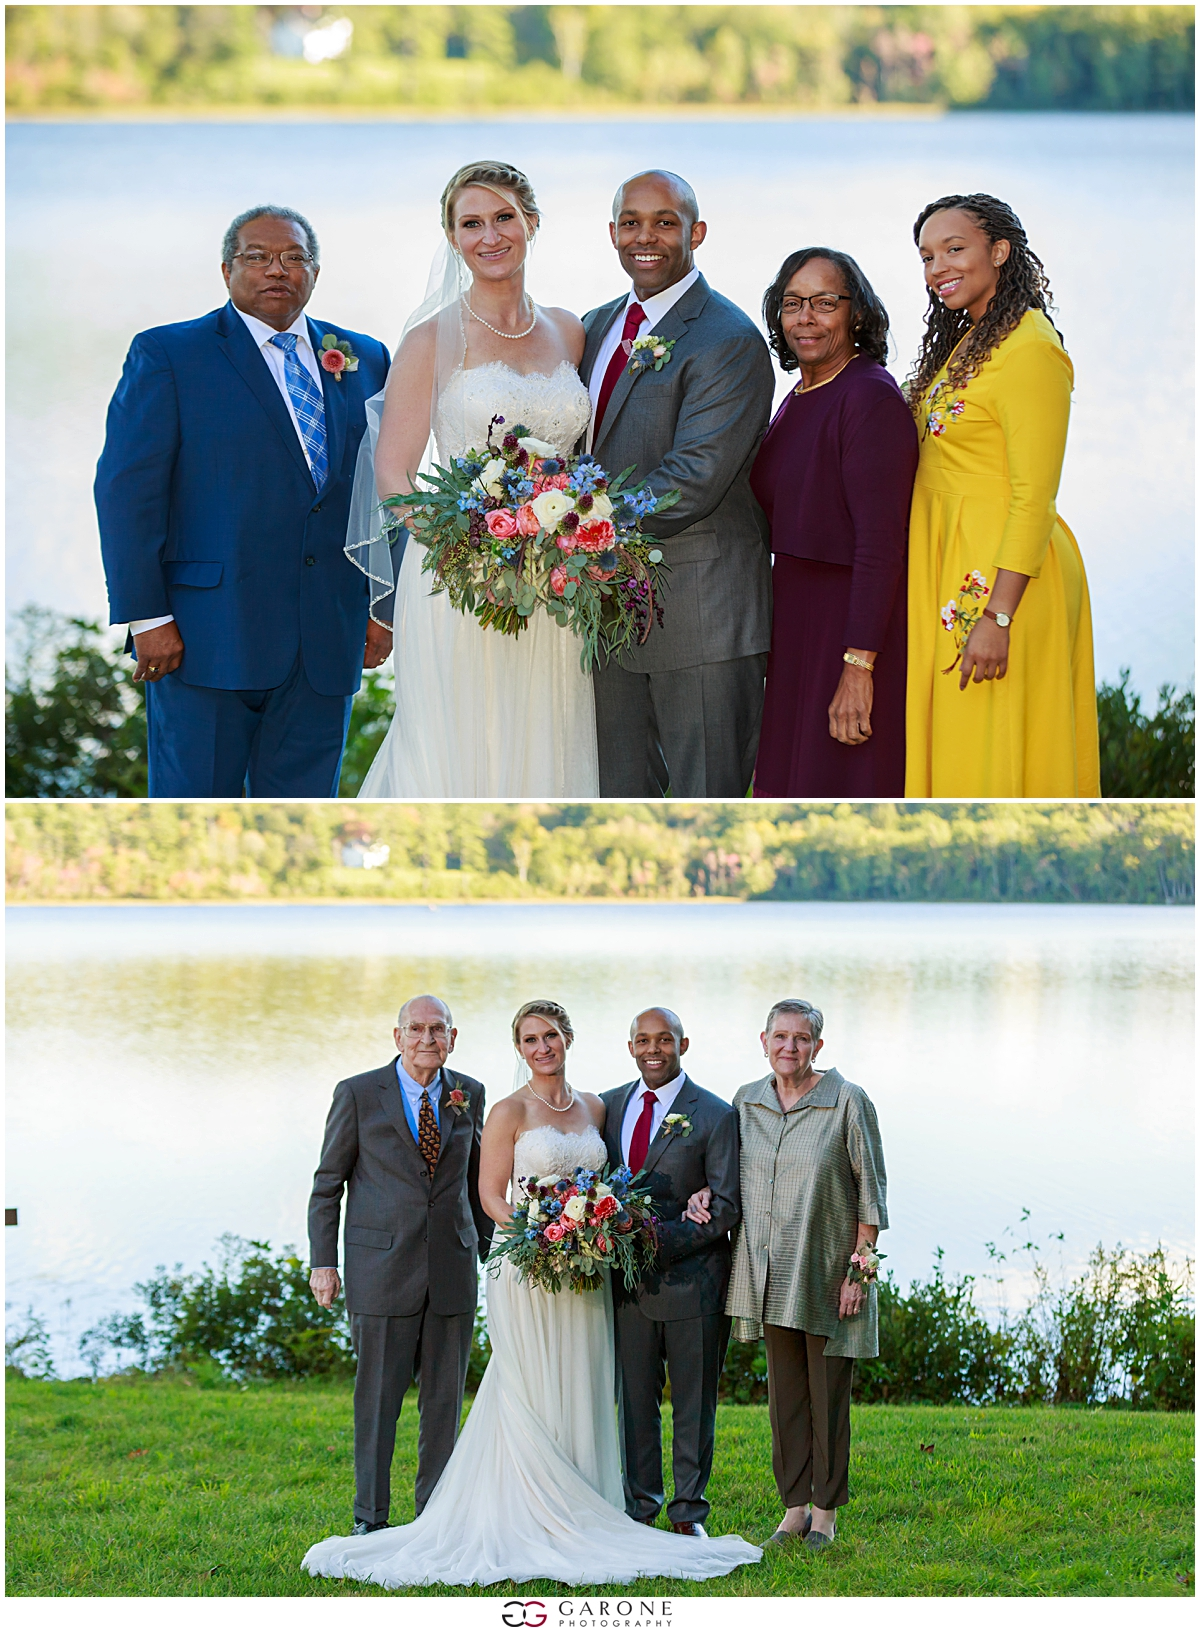 Kate_Matt_Backyard_Lake_Wedding_Garone_Photography_NH_Wedding_0022.jpg